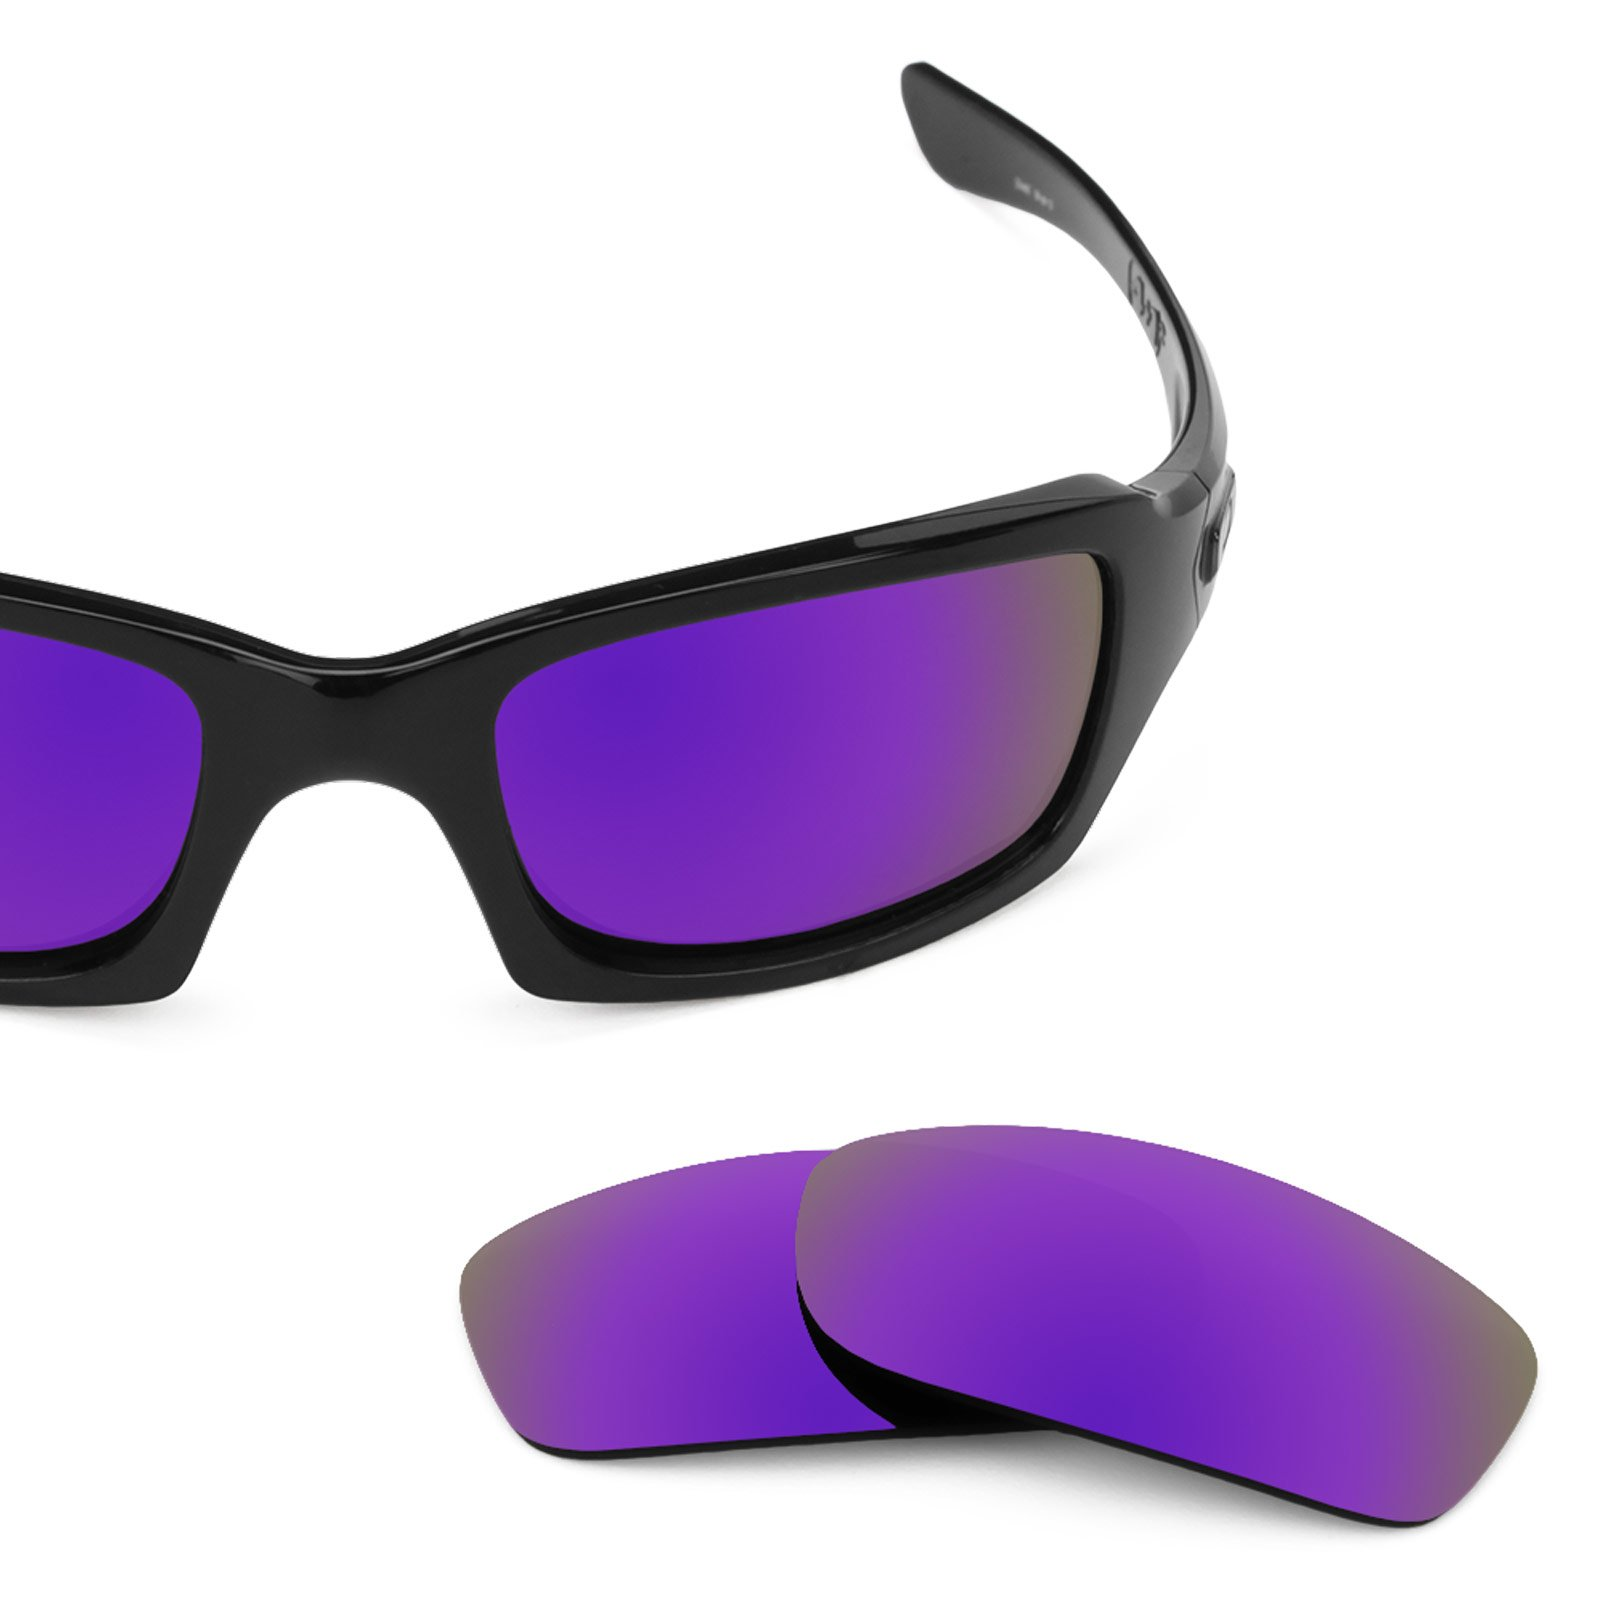 Revant Polarized Replacement Lenses for Oakley Fives Squared Plasma Purple MirrorShield